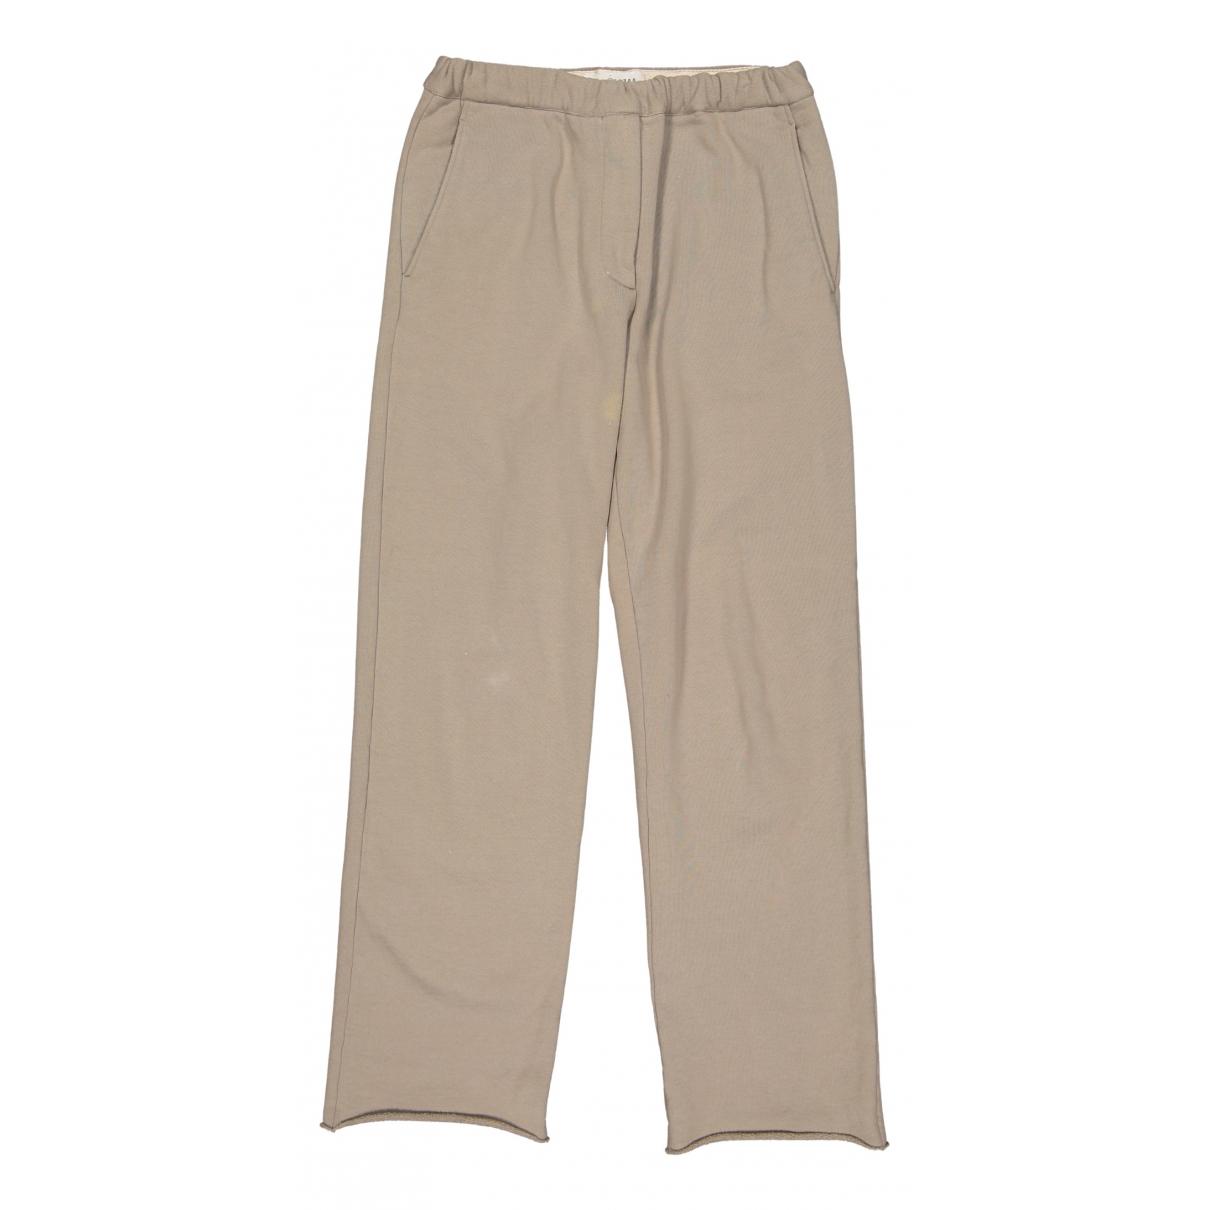 Maison Martin Margiela N Beige Cotton Trousers for Women 40 IT